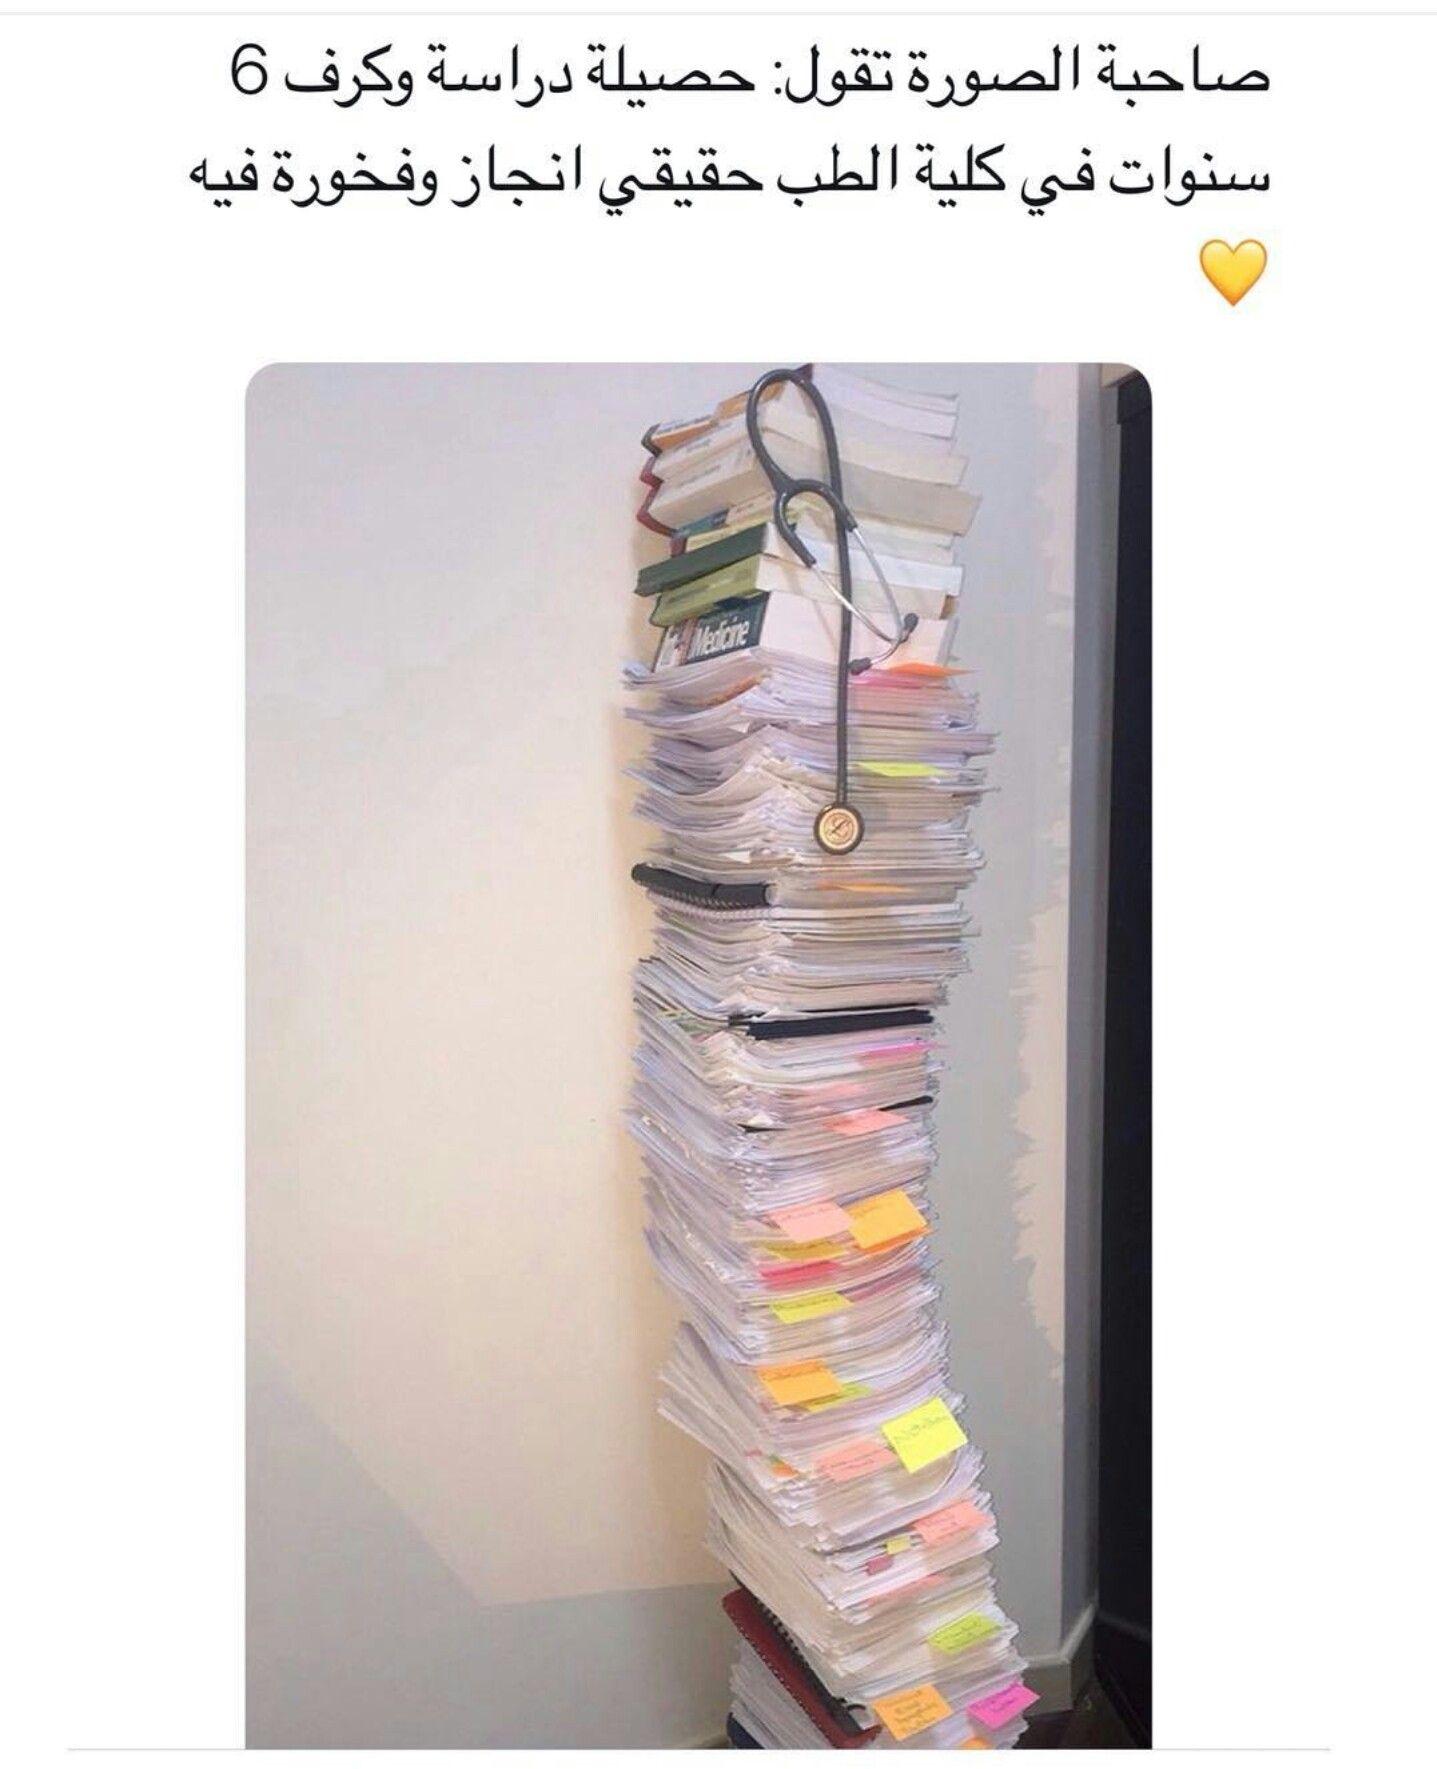 يارب اكون مثلها في يوم من الايام Study Motivation Quotes Medical Quotes Arabic Quotes